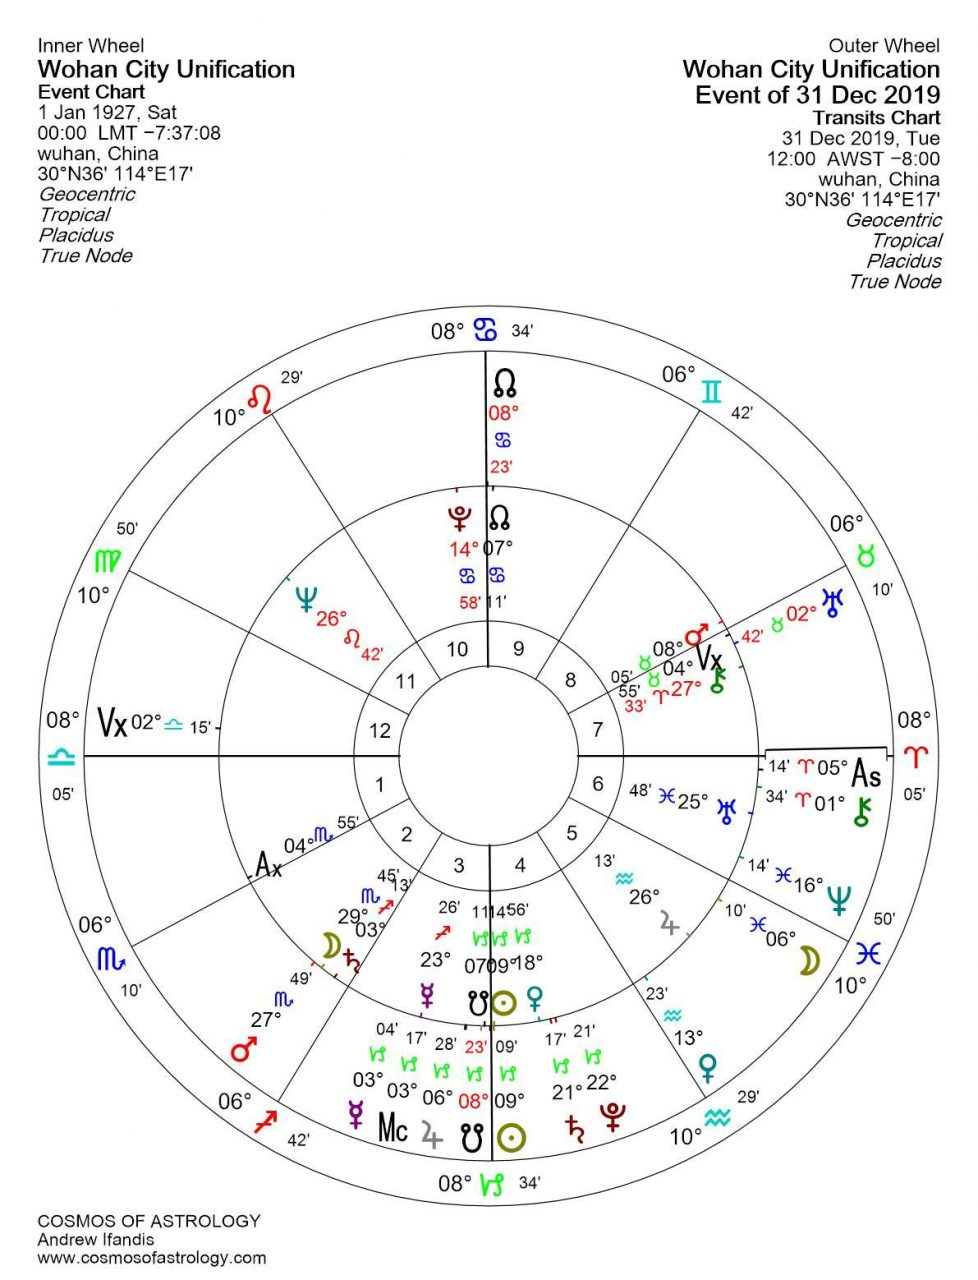 CORONAVIRUS ASTROLOGY - The astrological factors behind the epidemic